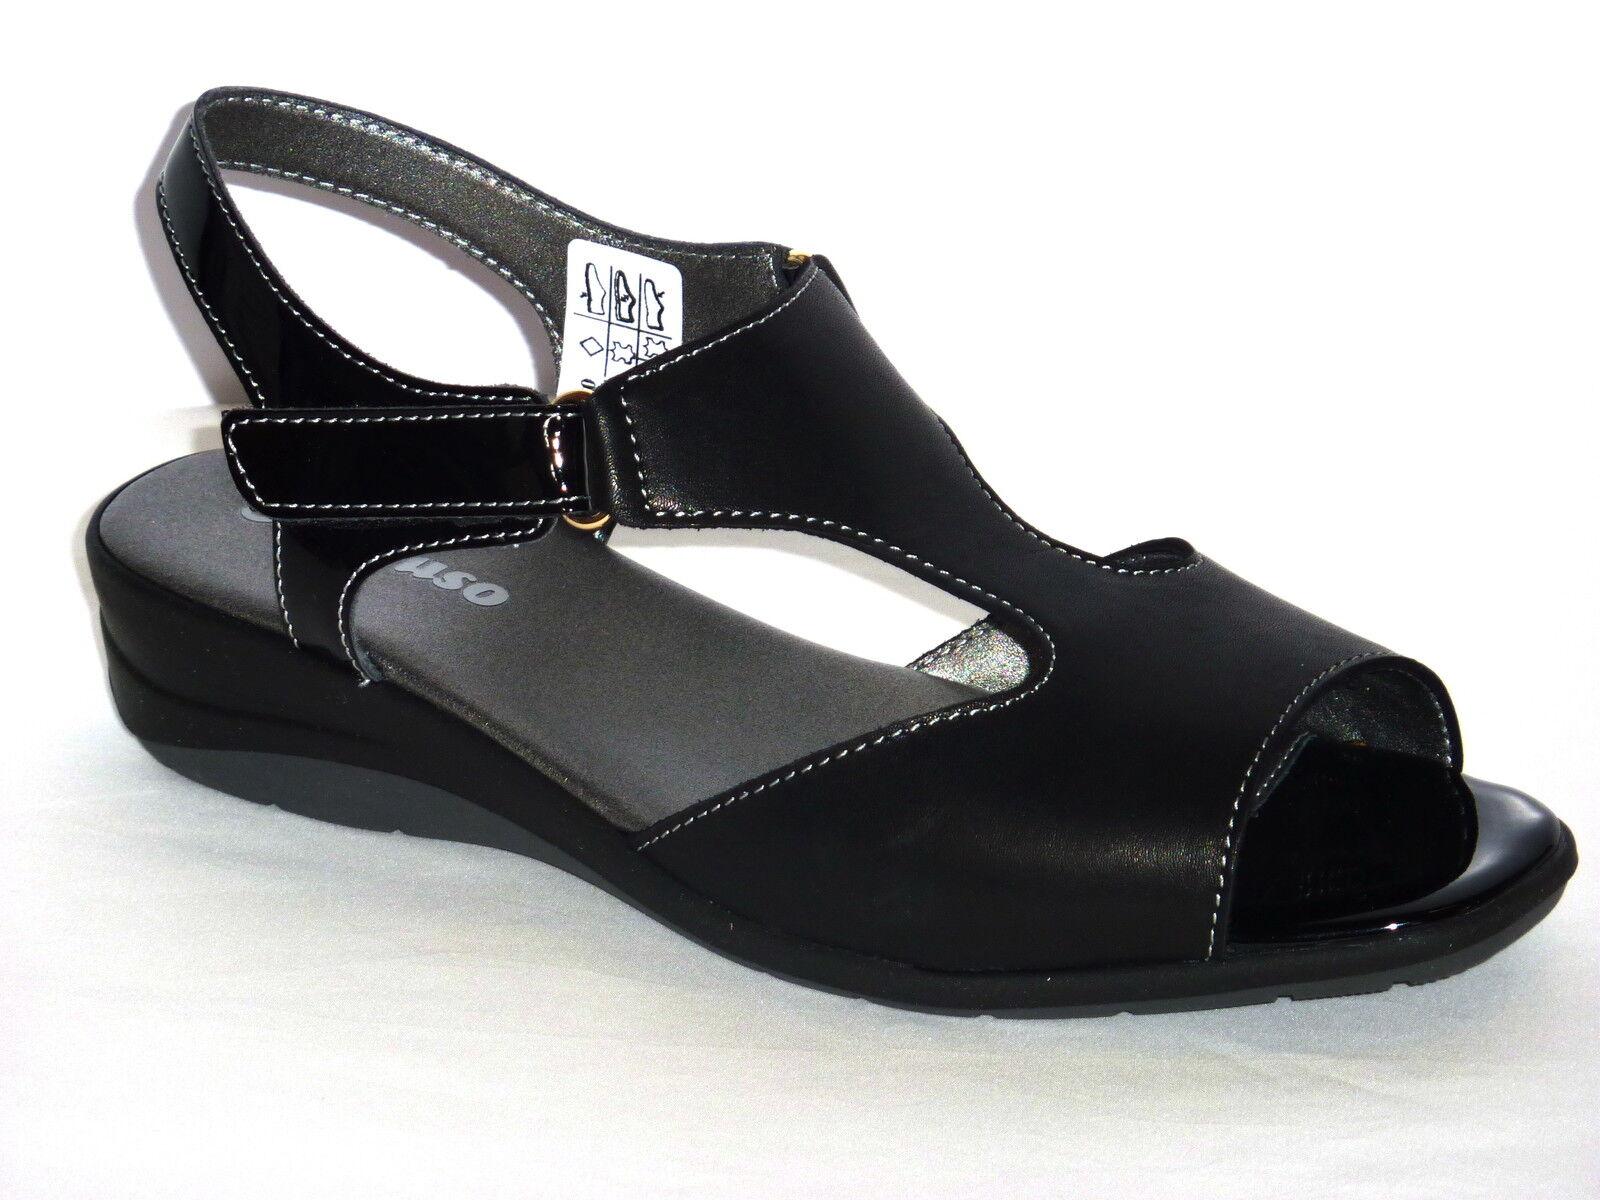 08990 MELLUSO SANDALI women TACCO BASSO ZEPPA black COMFORT n. 39